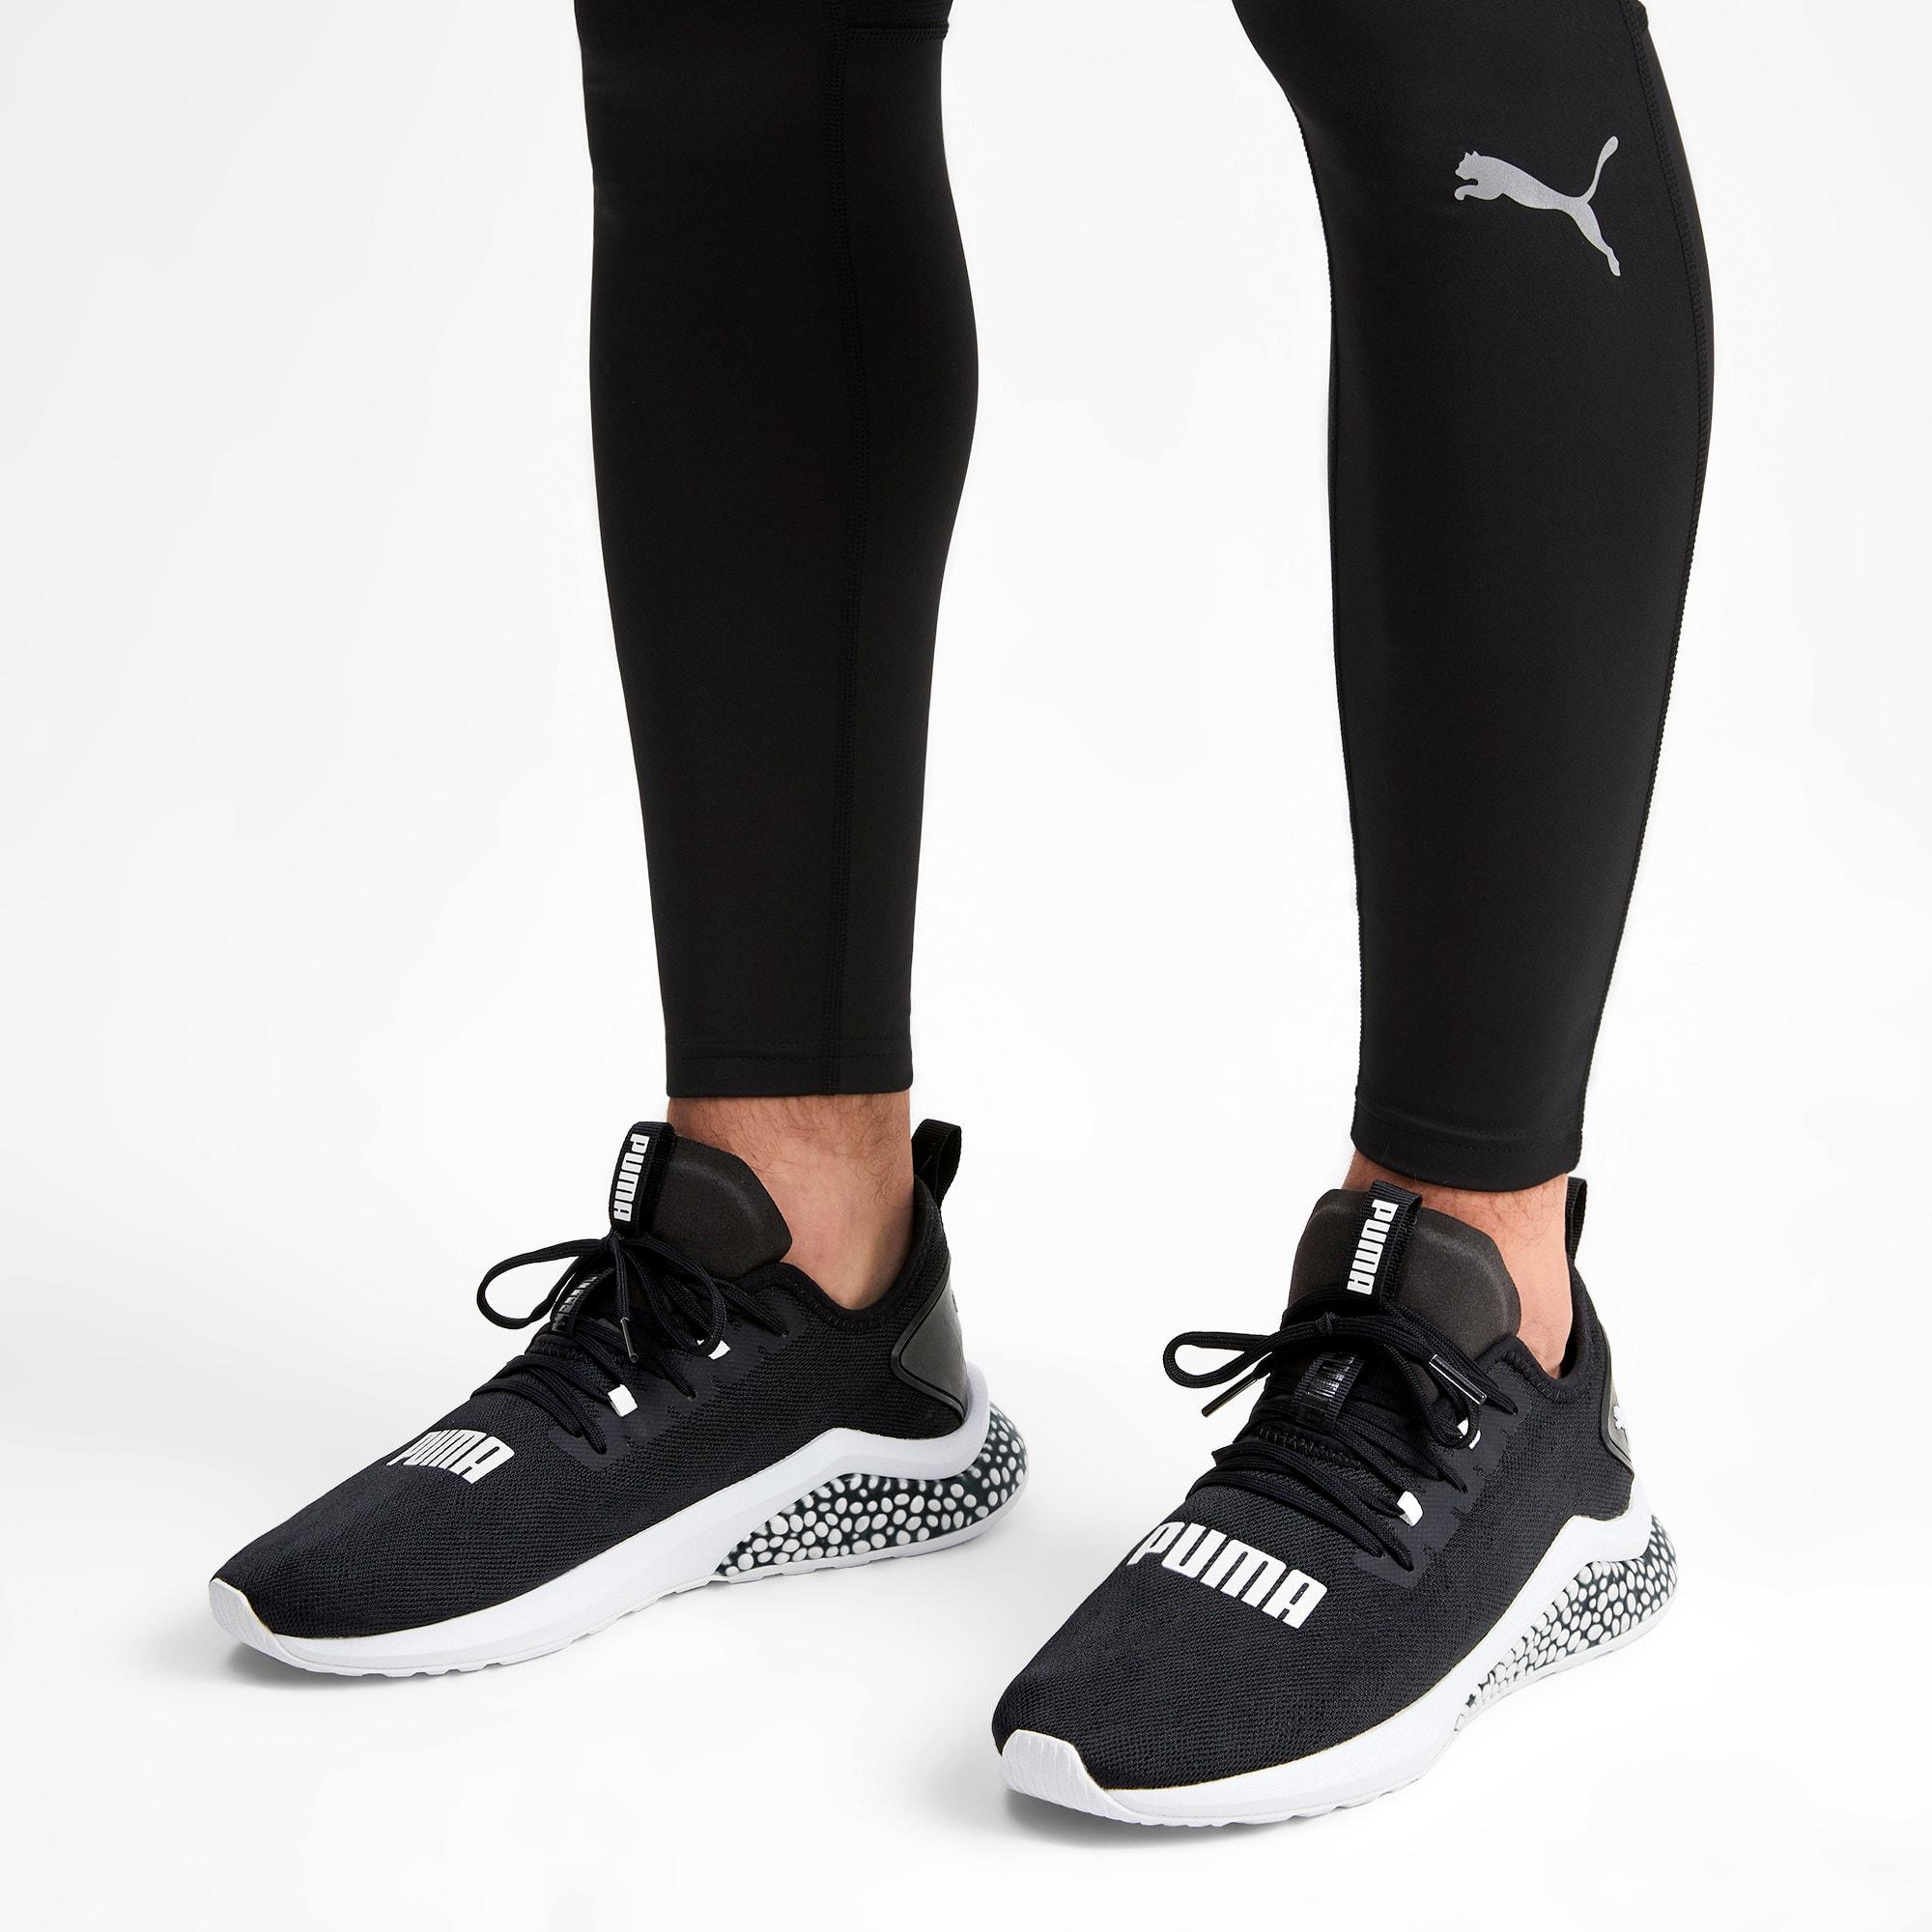 Thumbnail 2 of Hybrid NX Camo Men's Running Sneakers, Puma Black-Puma White, medium-IND